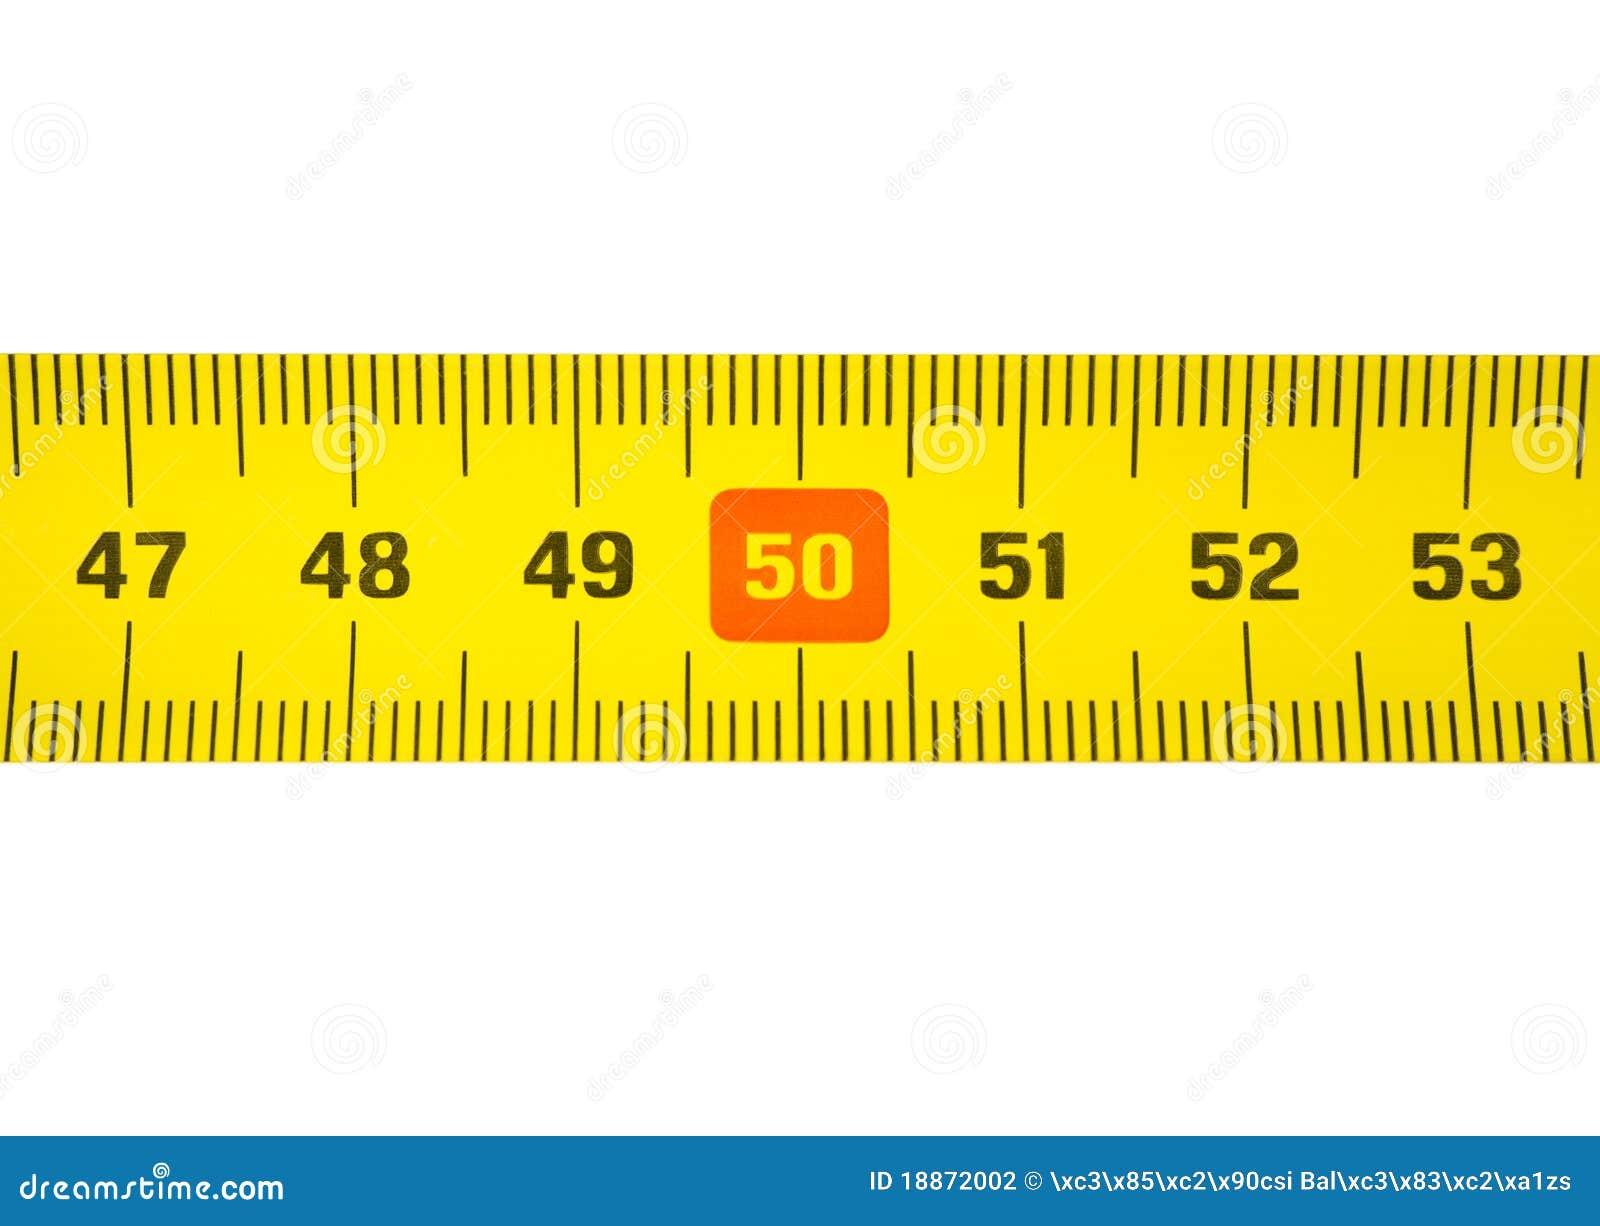 royaltyfree stock photo download tape measure 50